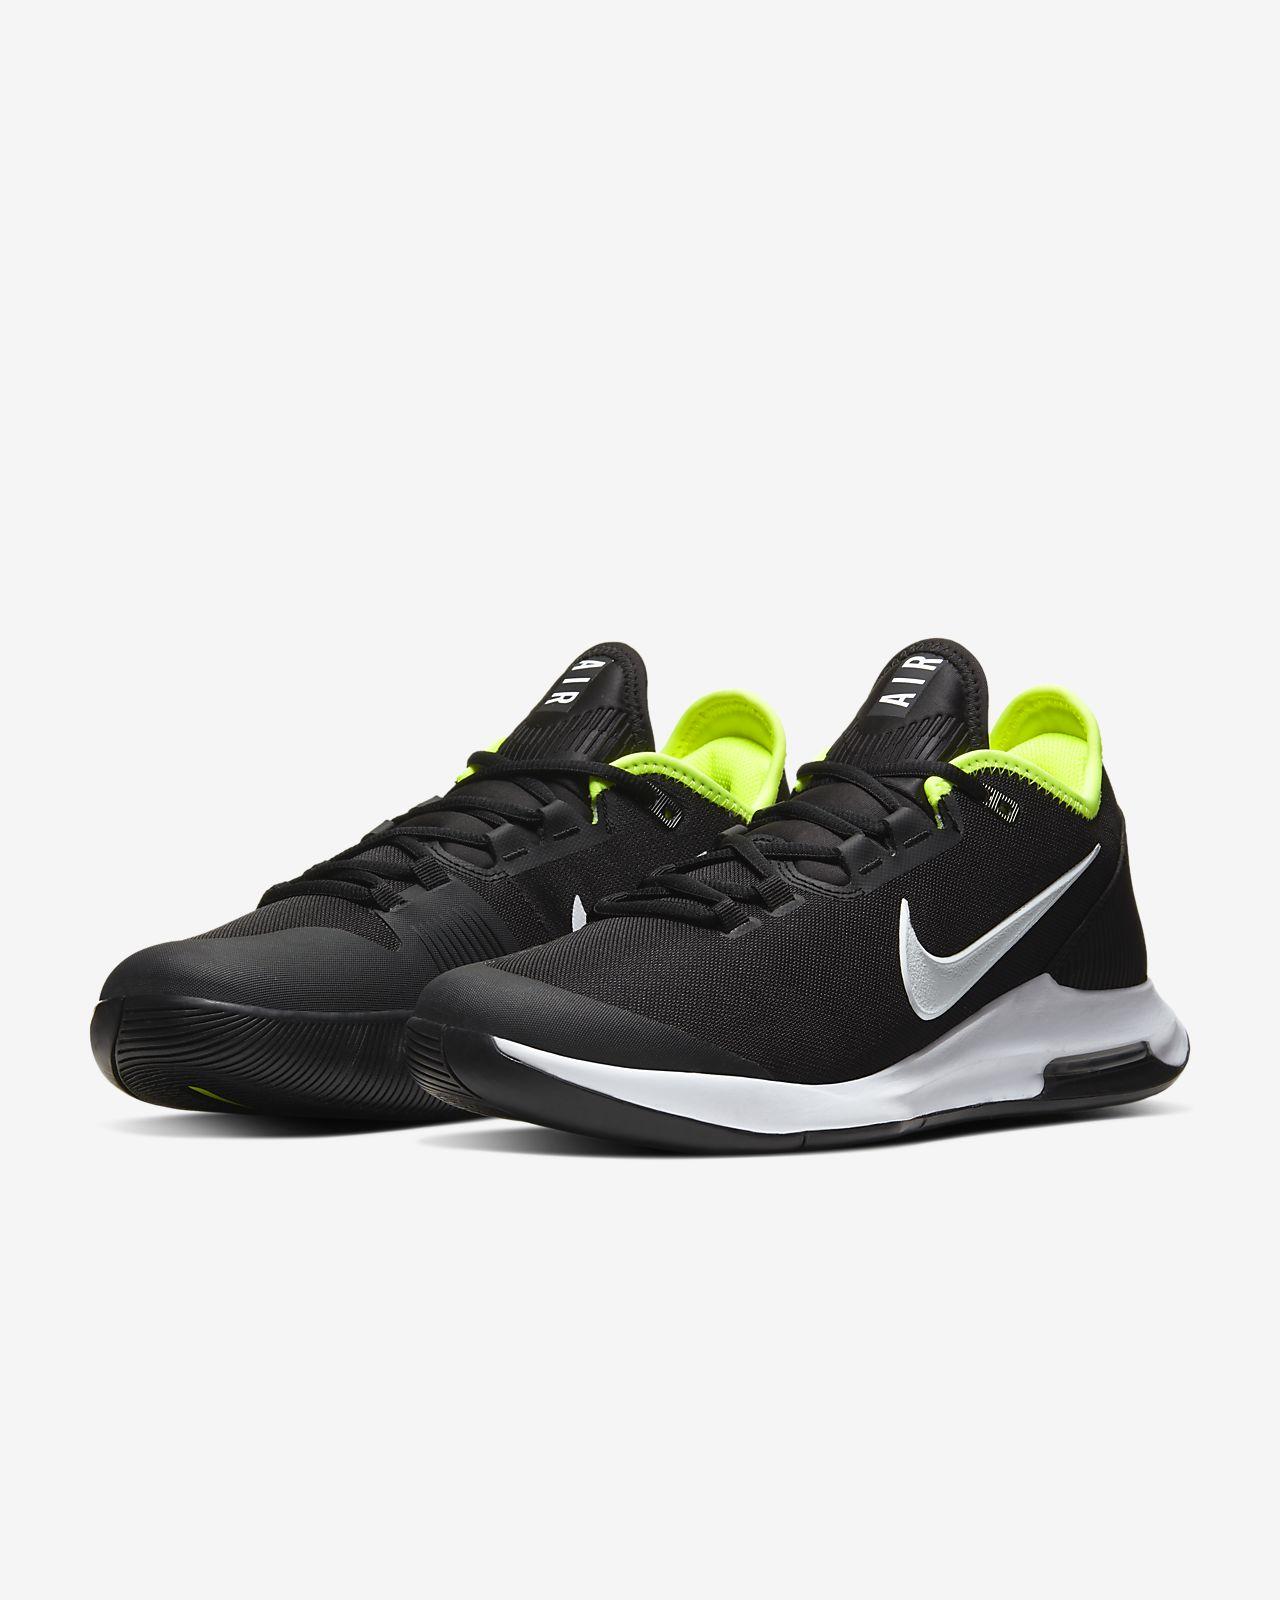 NikeCourt Air Max Wildcard Tennisschuh für Männer